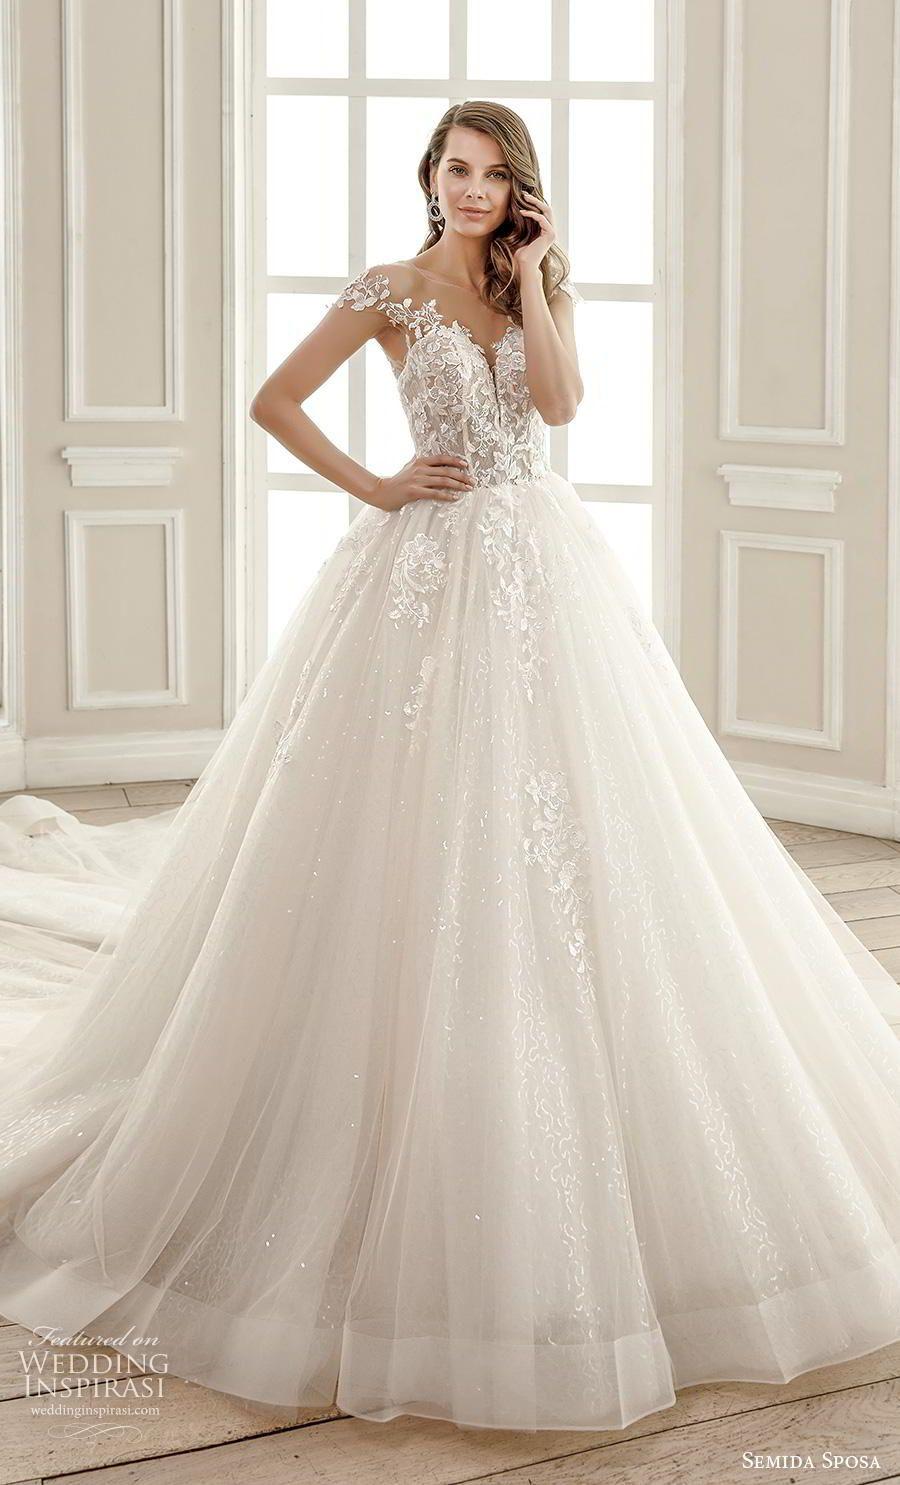 Semida Sposa 2020 Wedding Dresses Amazon Bridal Collection Wedding Dresses Wedding Dresses Lace Royal Wedding Dress